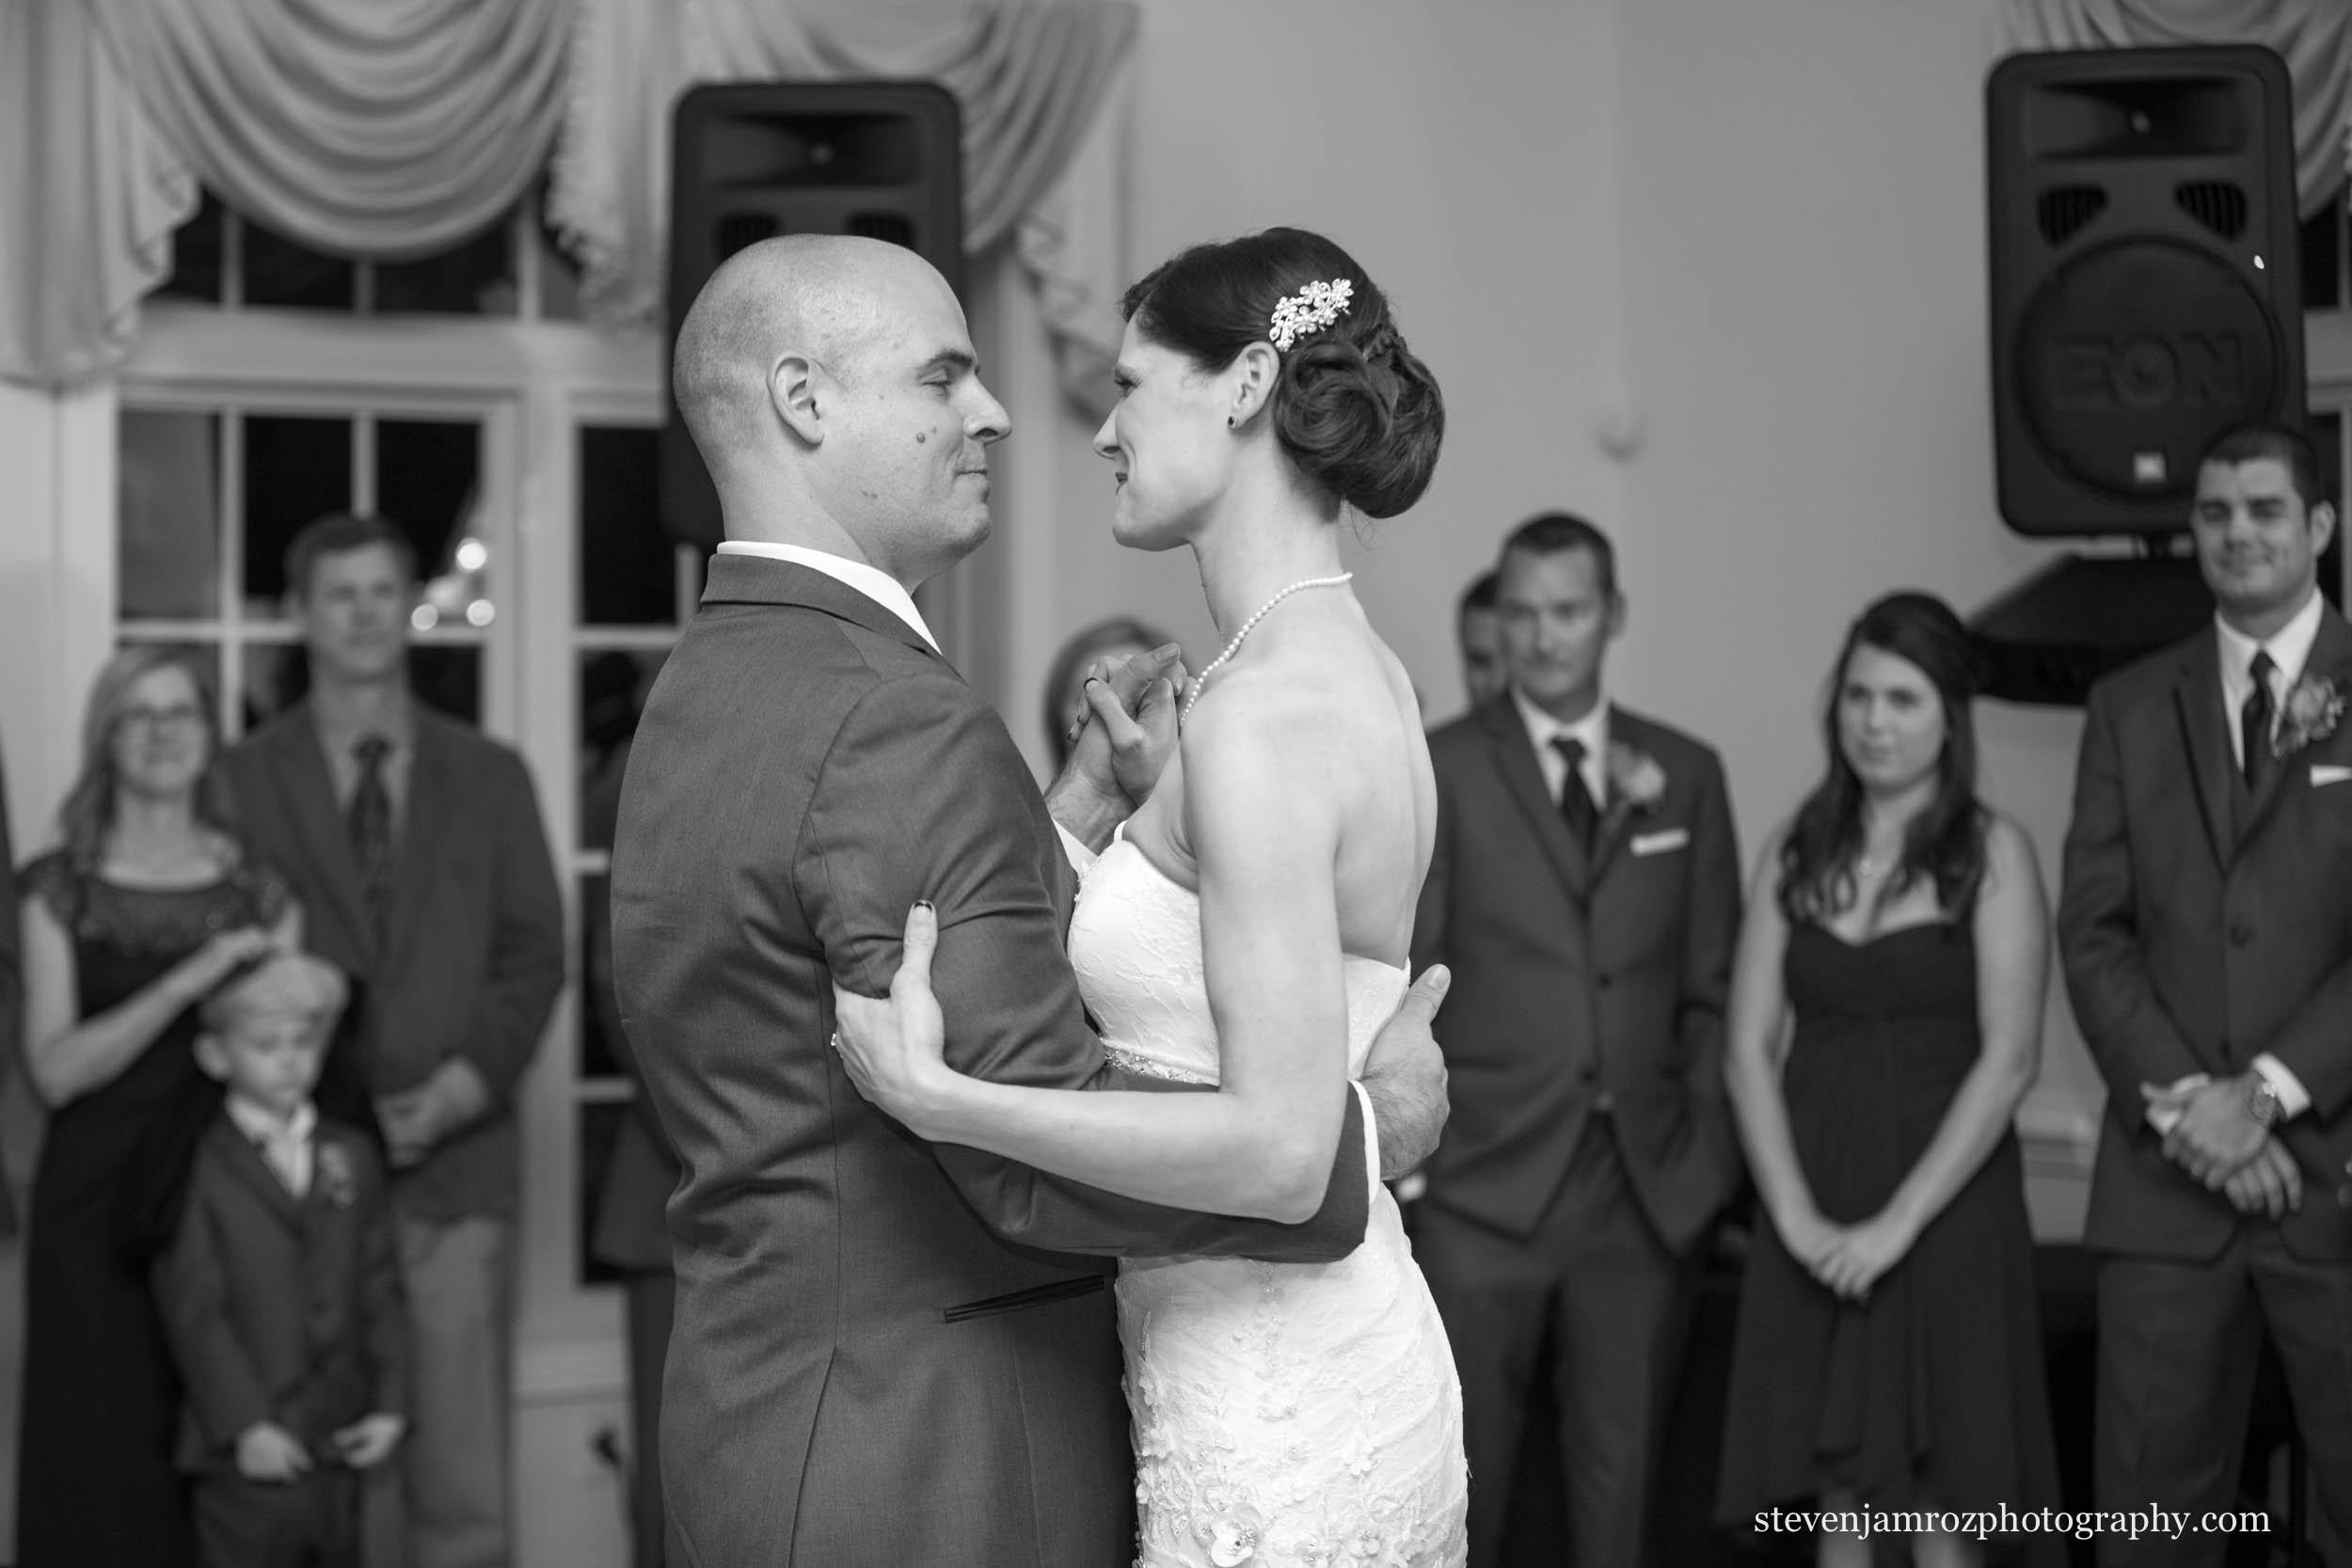 hudson-manor-ballroom-wedding-steven-jamroz-photography-0630.jpg